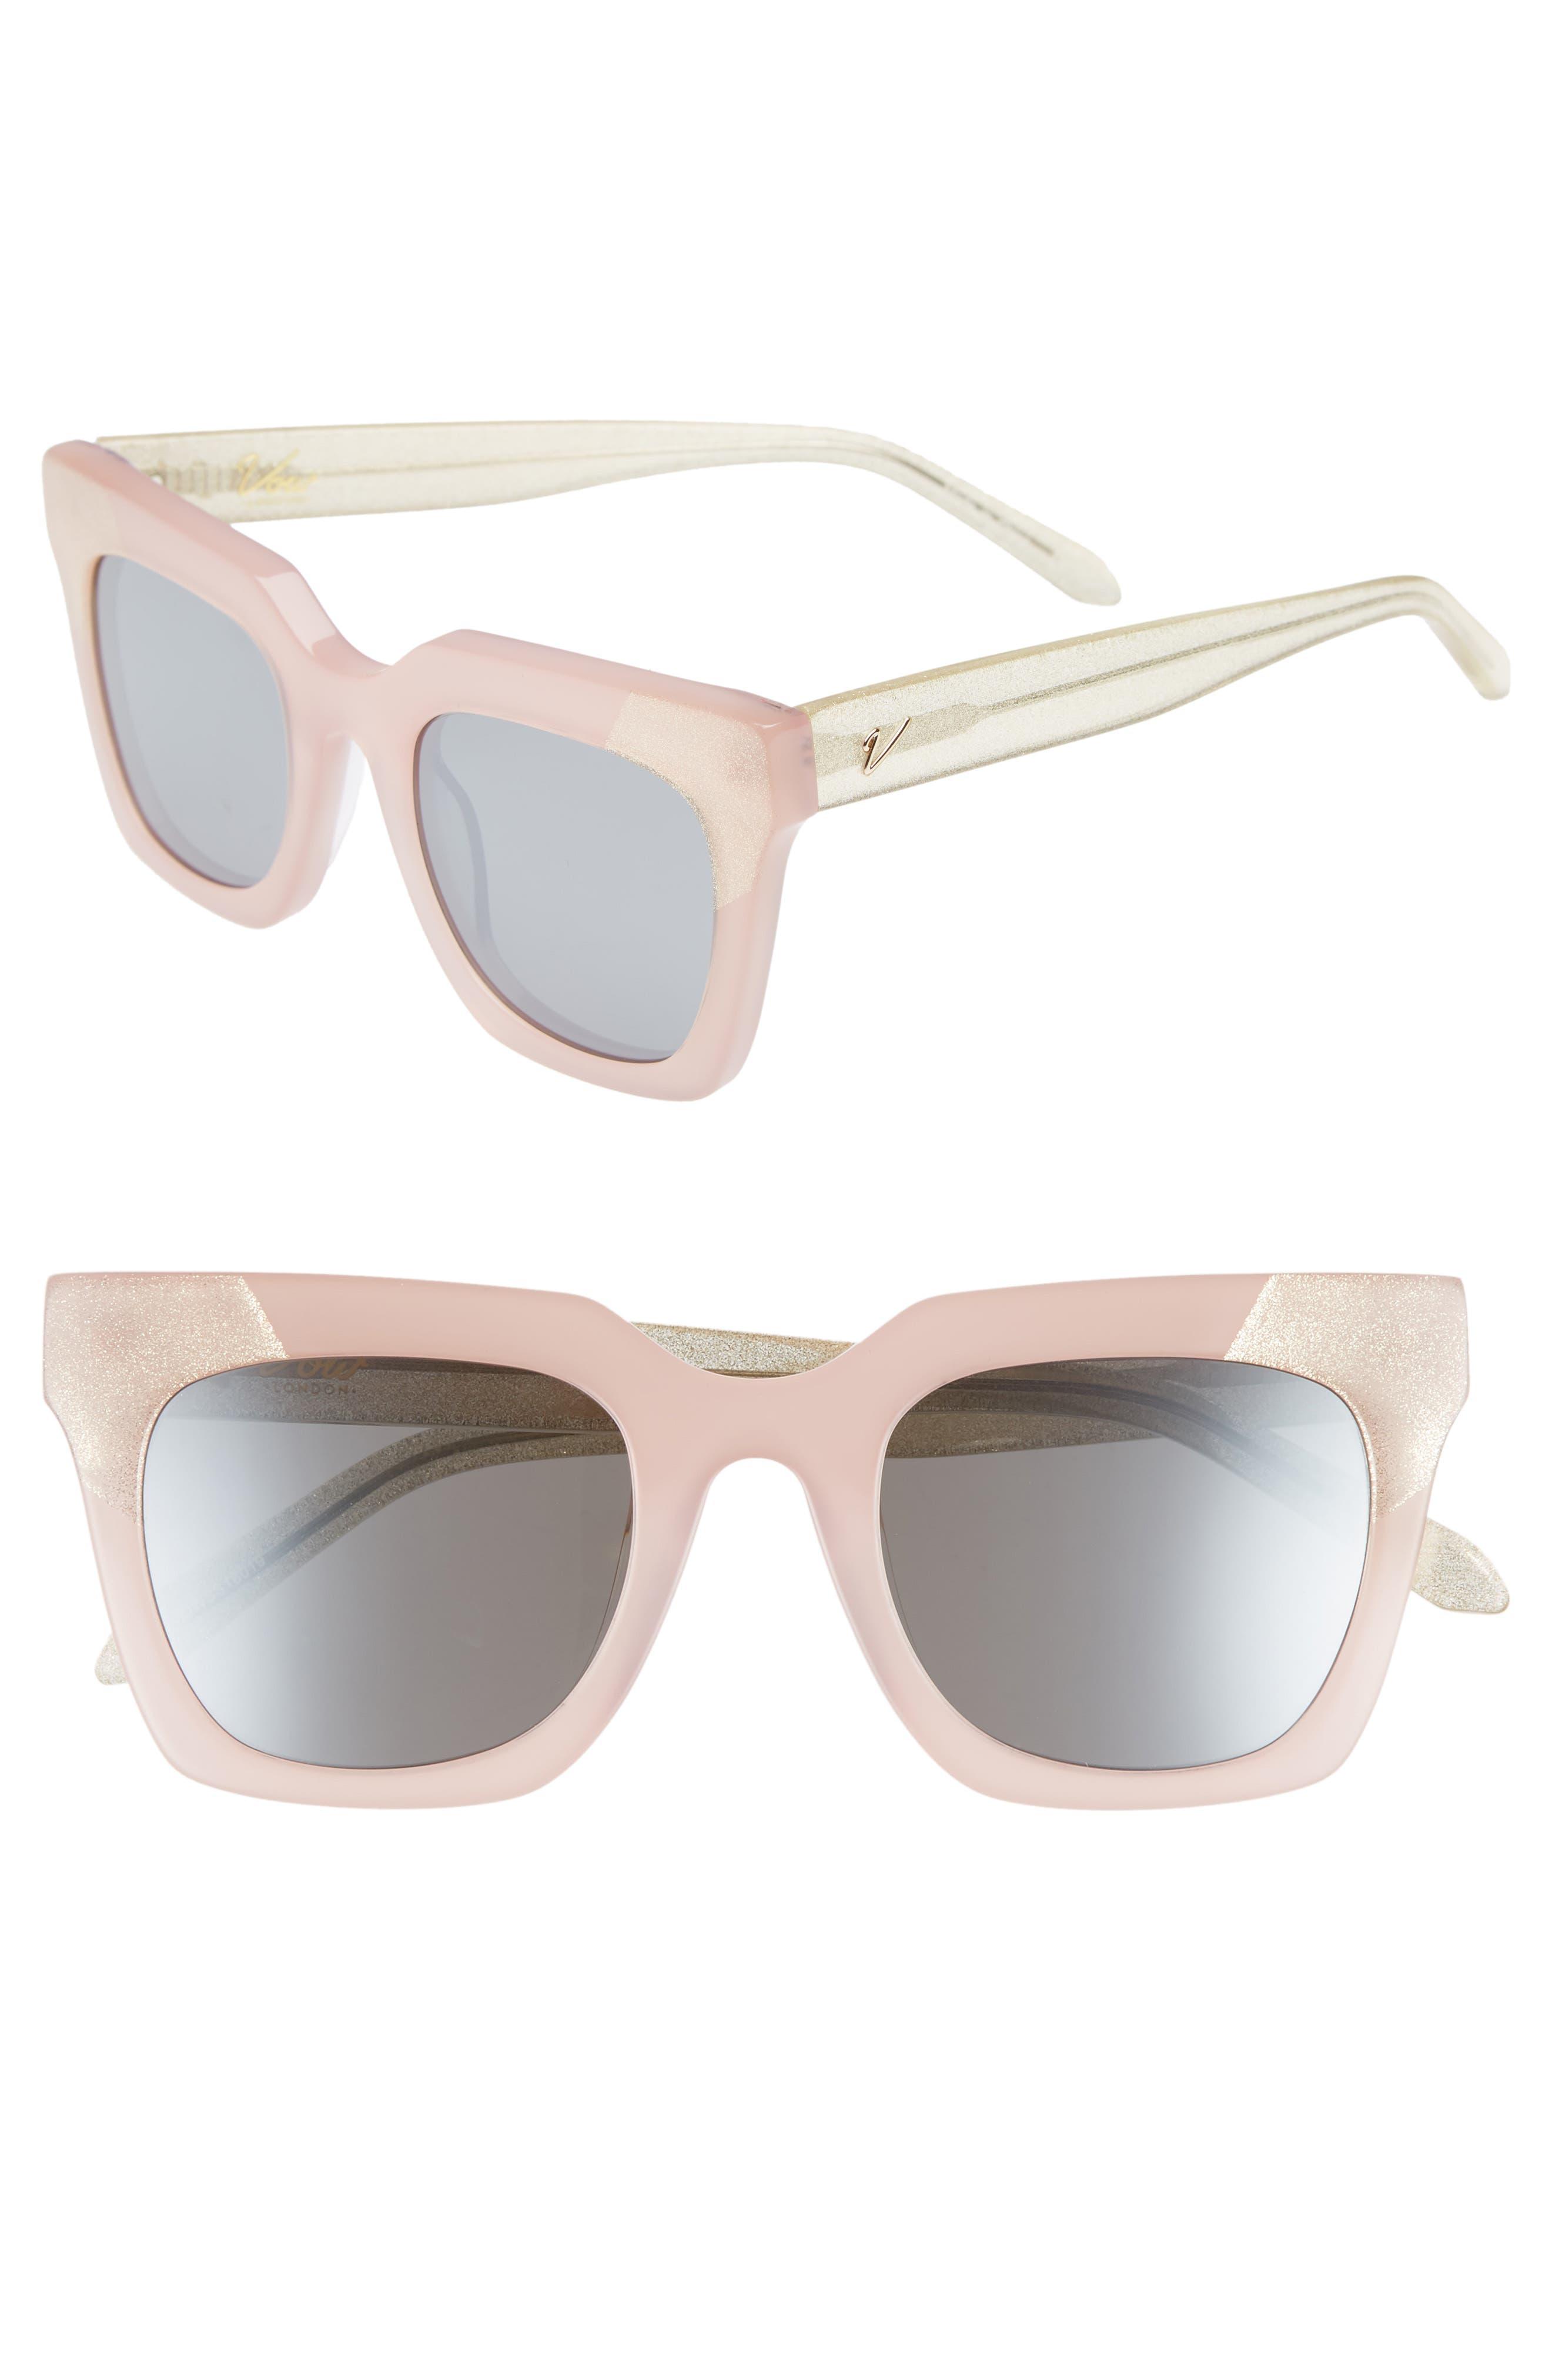 Riley 50mm Cat Eye Sunglasses,                             Main thumbnail 1, color,                             Milky Pink/ Smoke